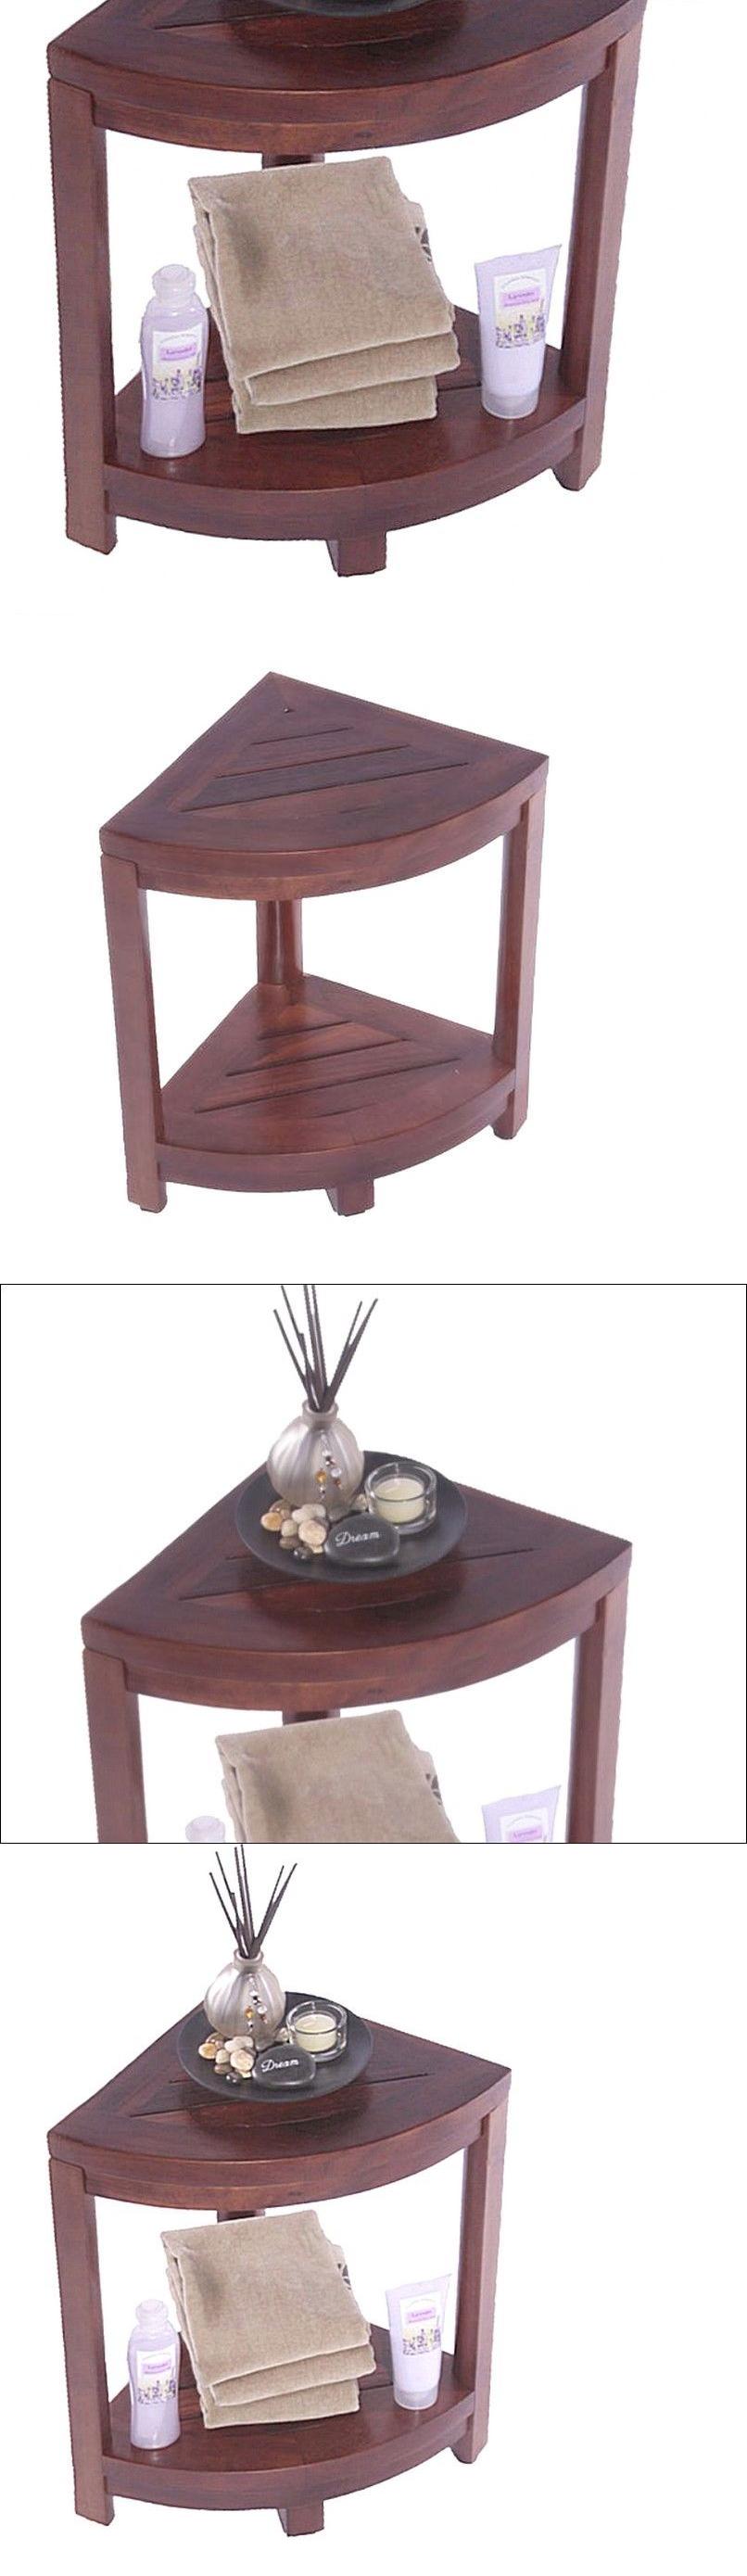 Small Corner Table For Bathroom Choice Image - Table Decoration Ideas